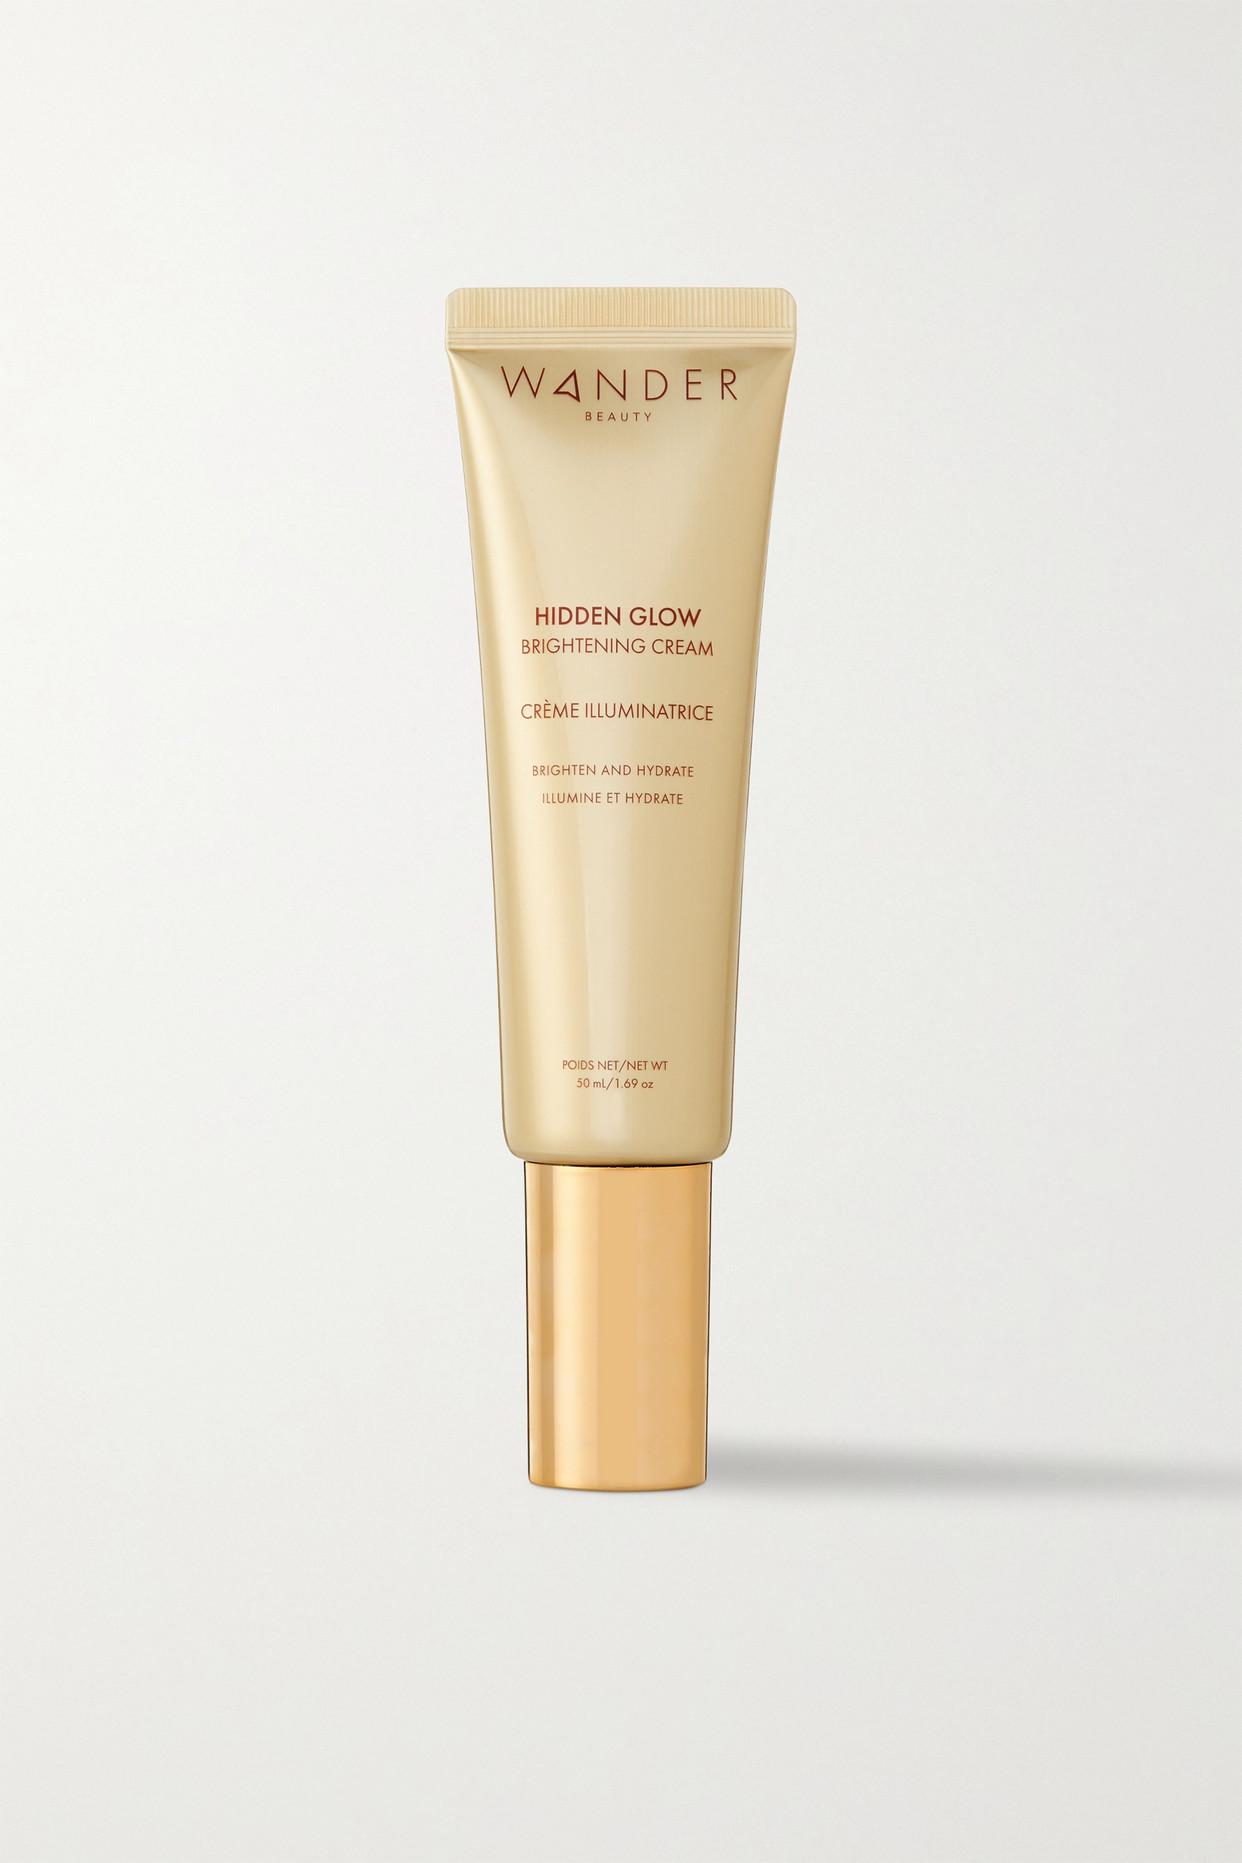 WANDER BEAUTY - Hidden Glow Brightening Cream, 50ml - one size